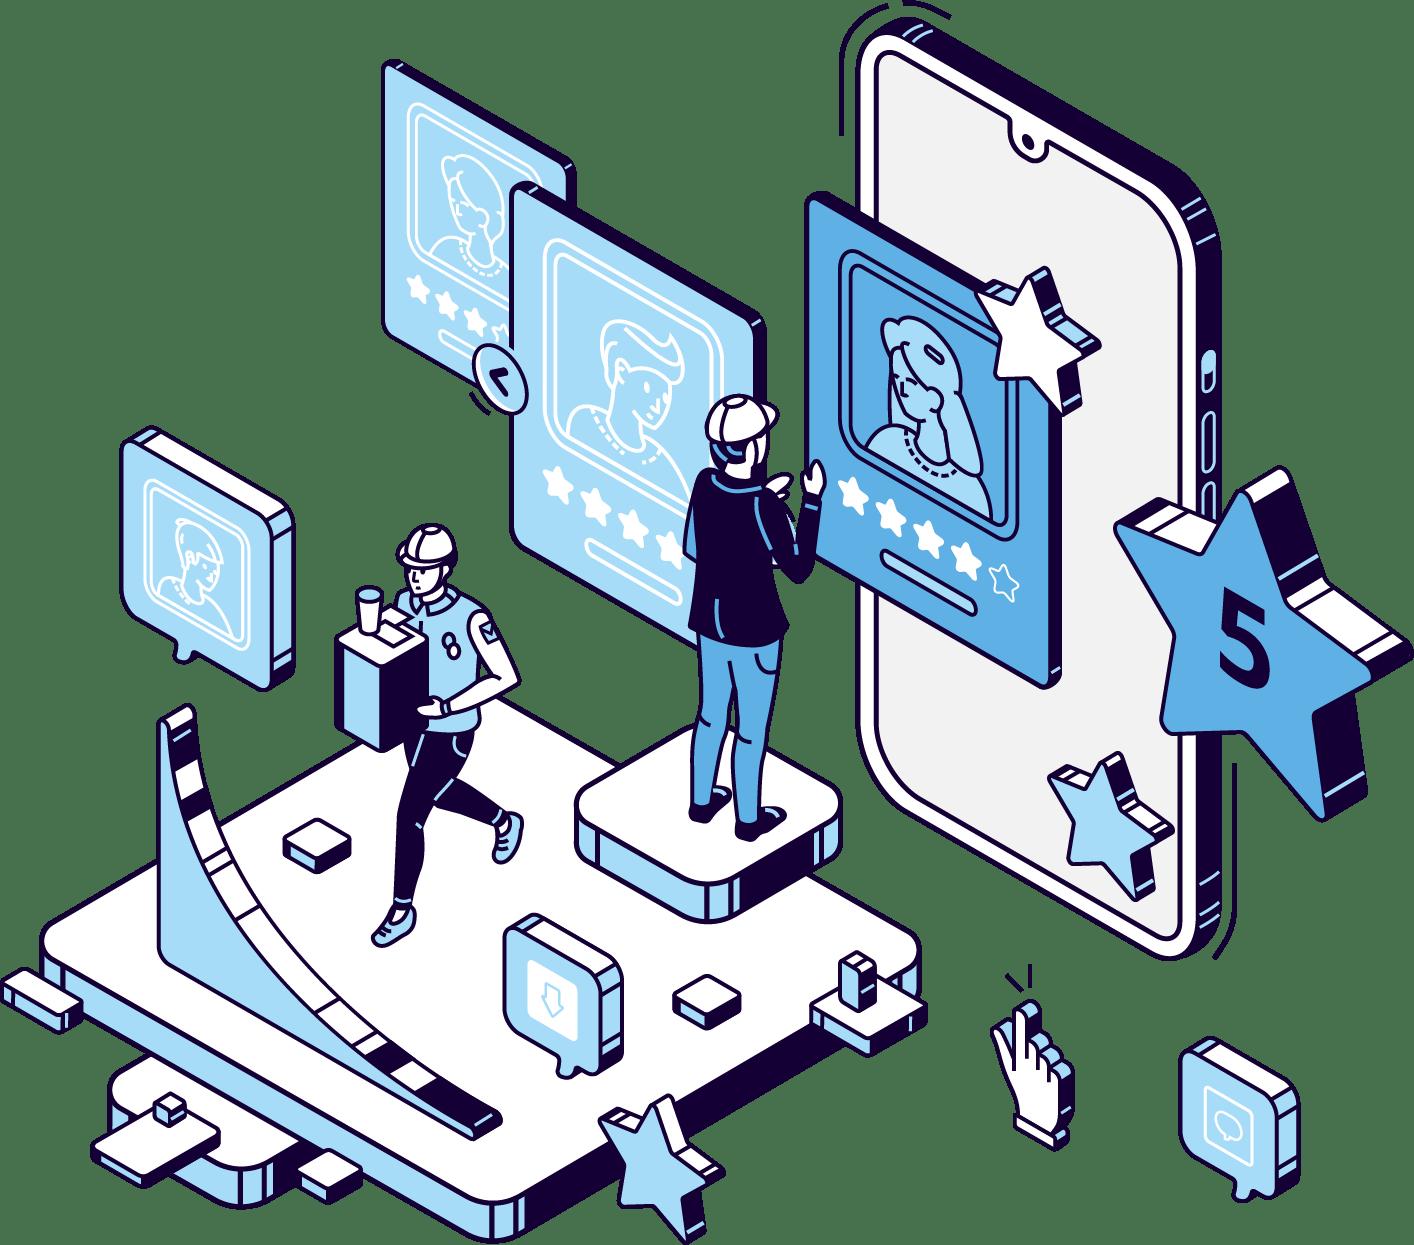 Decentralized Peer-to-Peer Marketplace